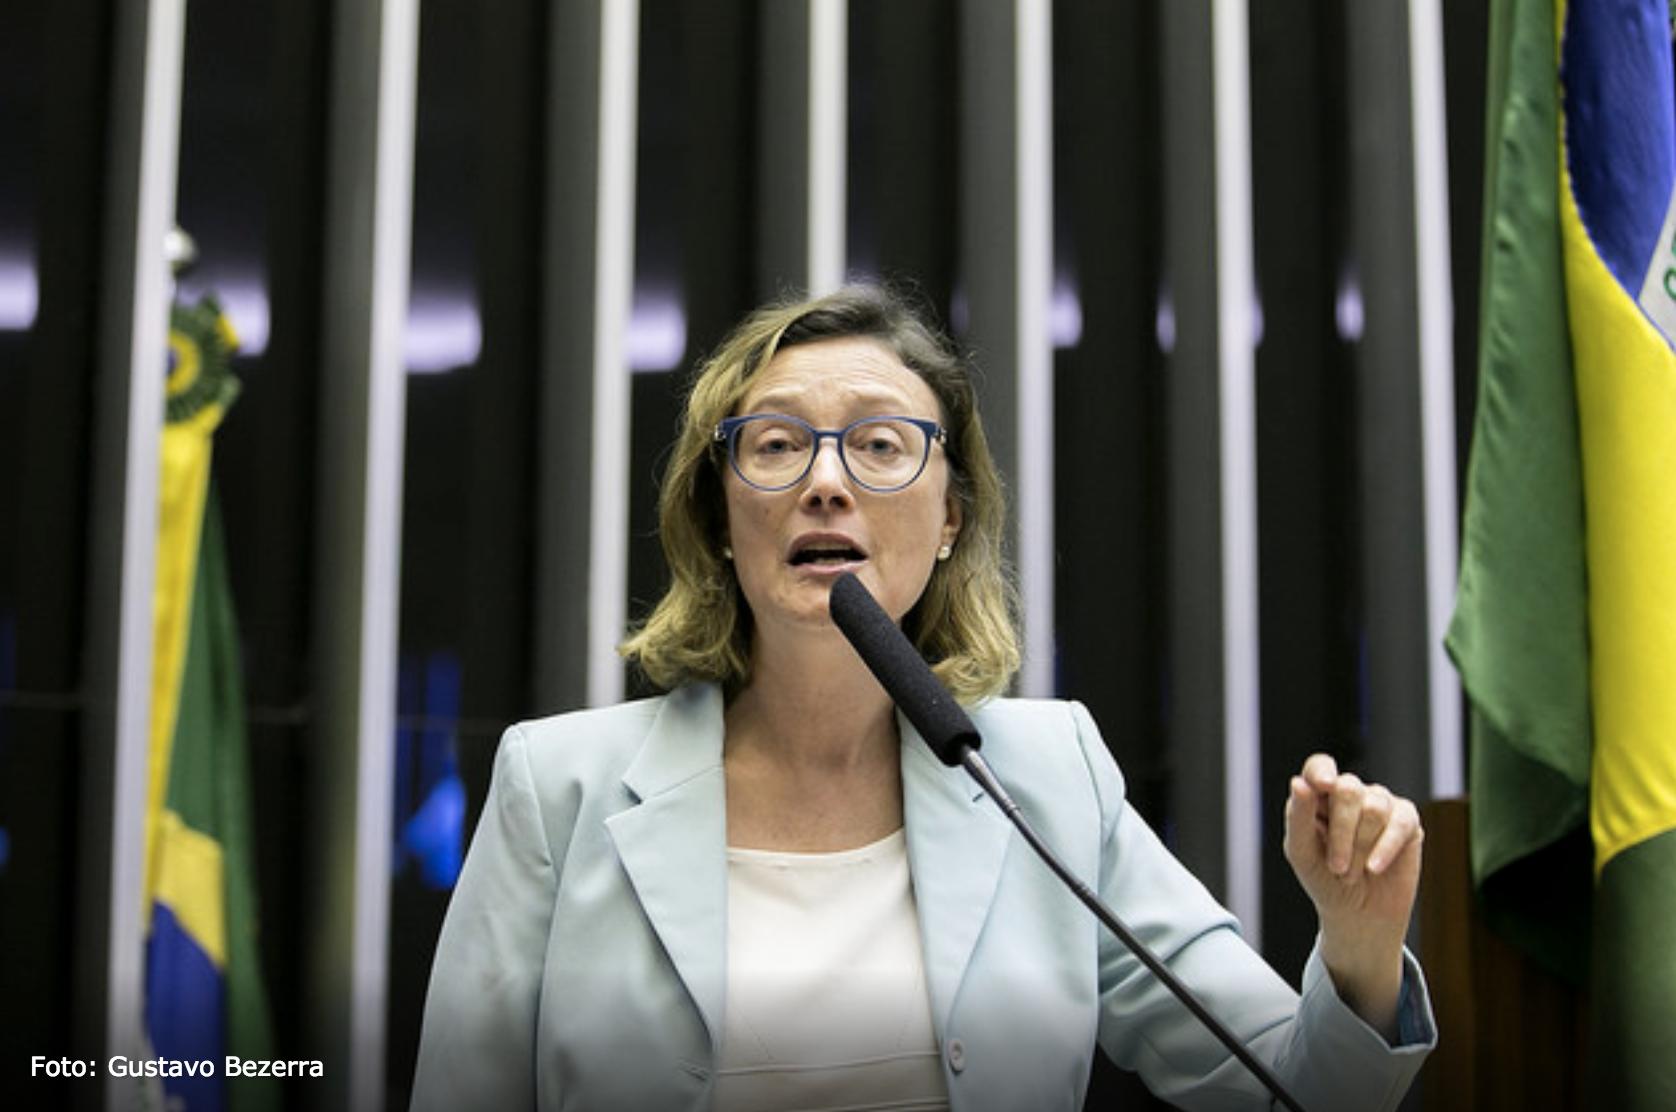 Marco Aurélio reitera: Bolsonaro tem de pedir desculpas a Maria do Rosário no You Tube e no Facebook